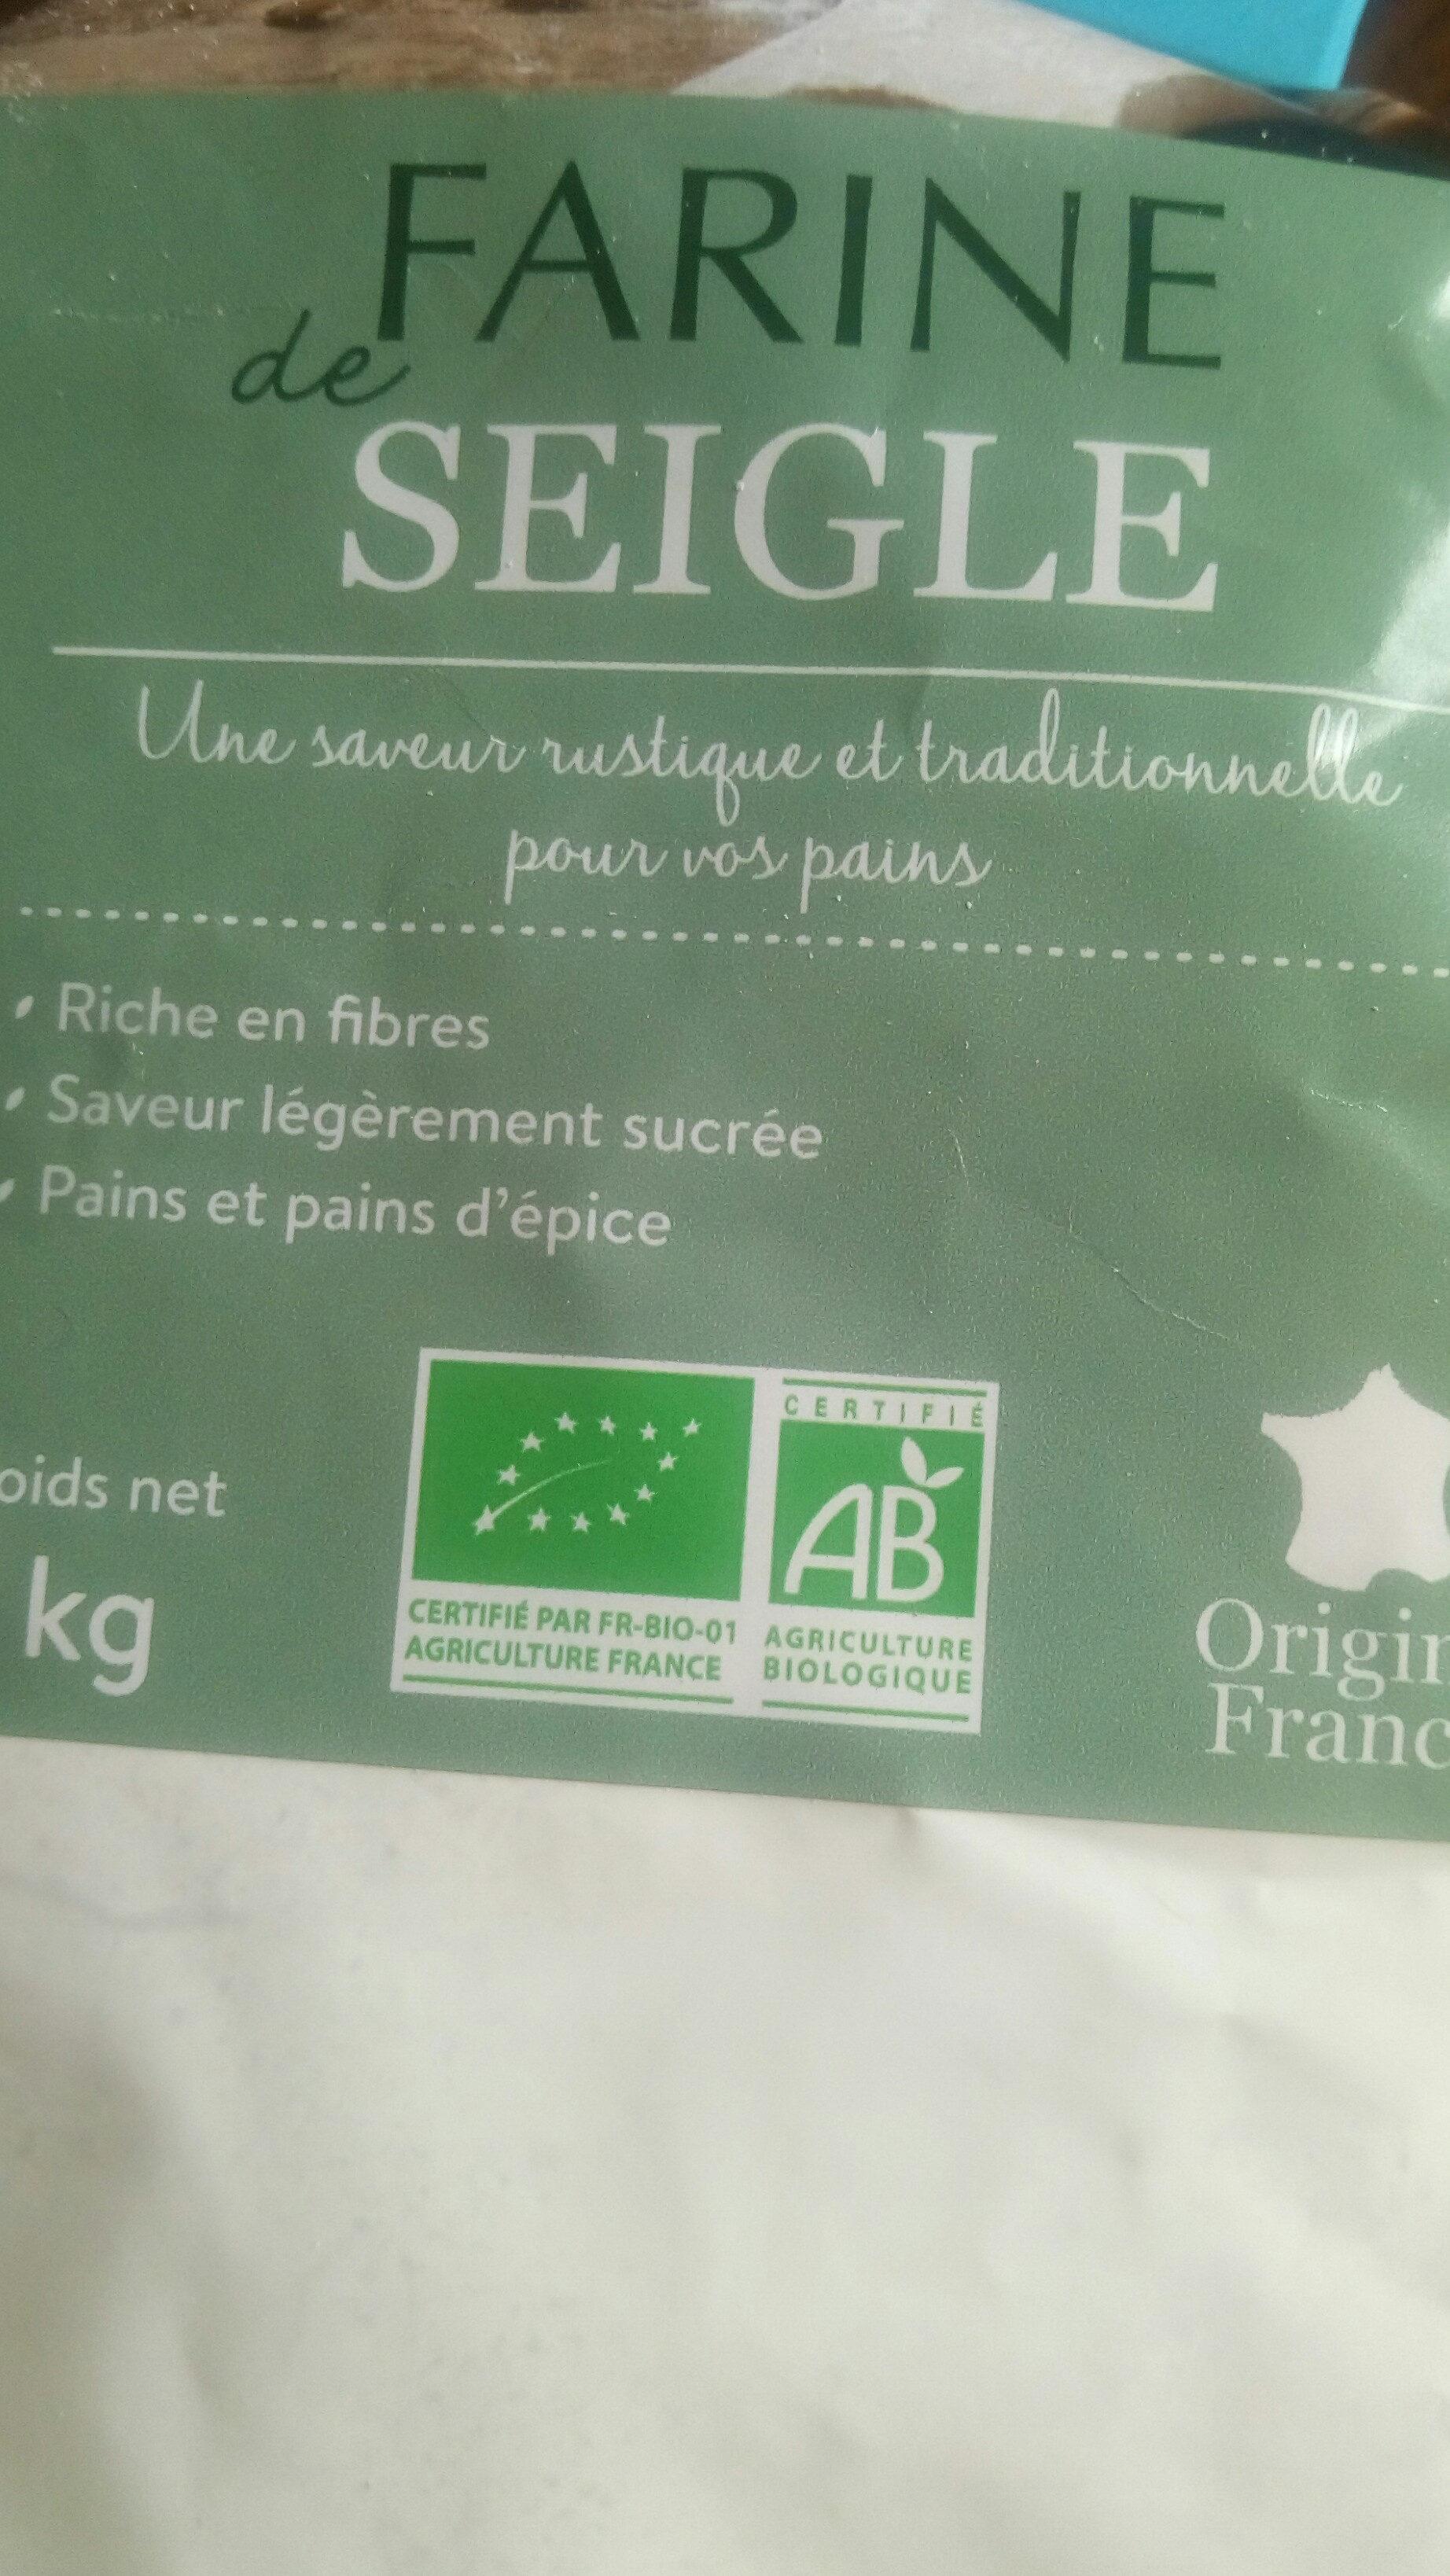 farine de seigle - Produit - fr